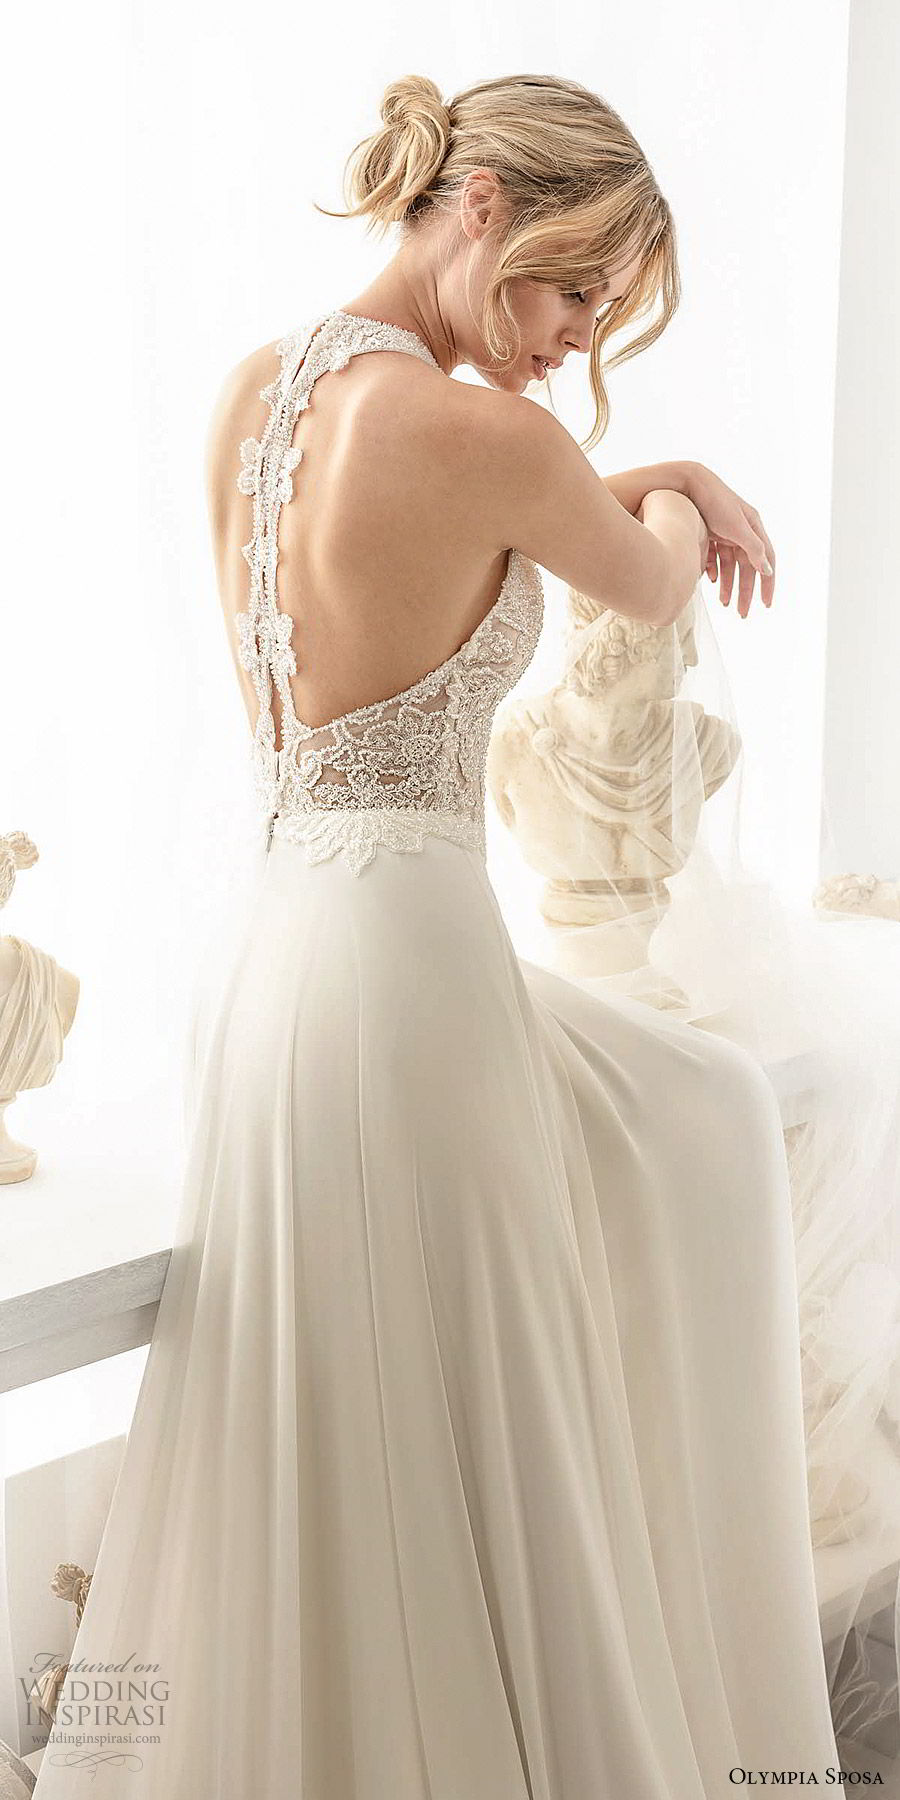 olympia sposa 2020 bridal sleeveless halter neck embellished beaded bodice a line wedding dress (5) romantic elegant racer back chapel train zbv